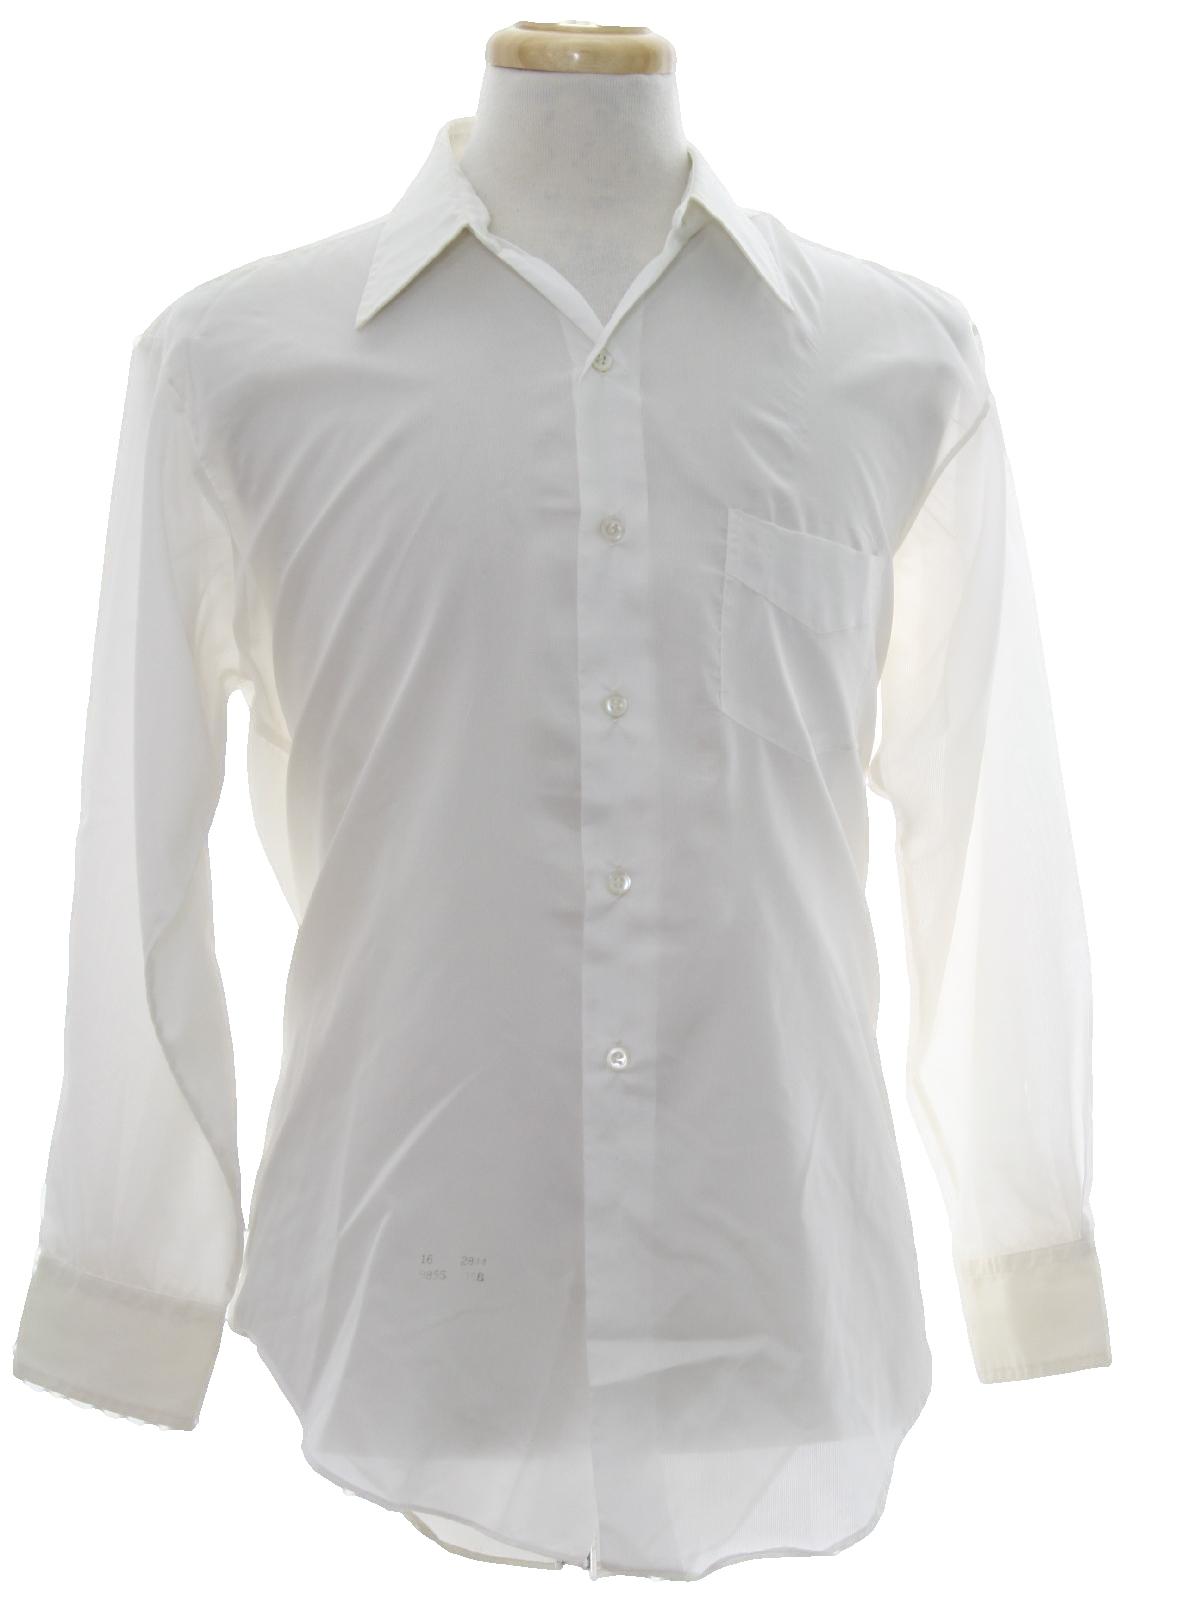 313e4149c Sherbrooke Seventies Vintage Shirt: 70s -Sherbrooke- Mens white ...